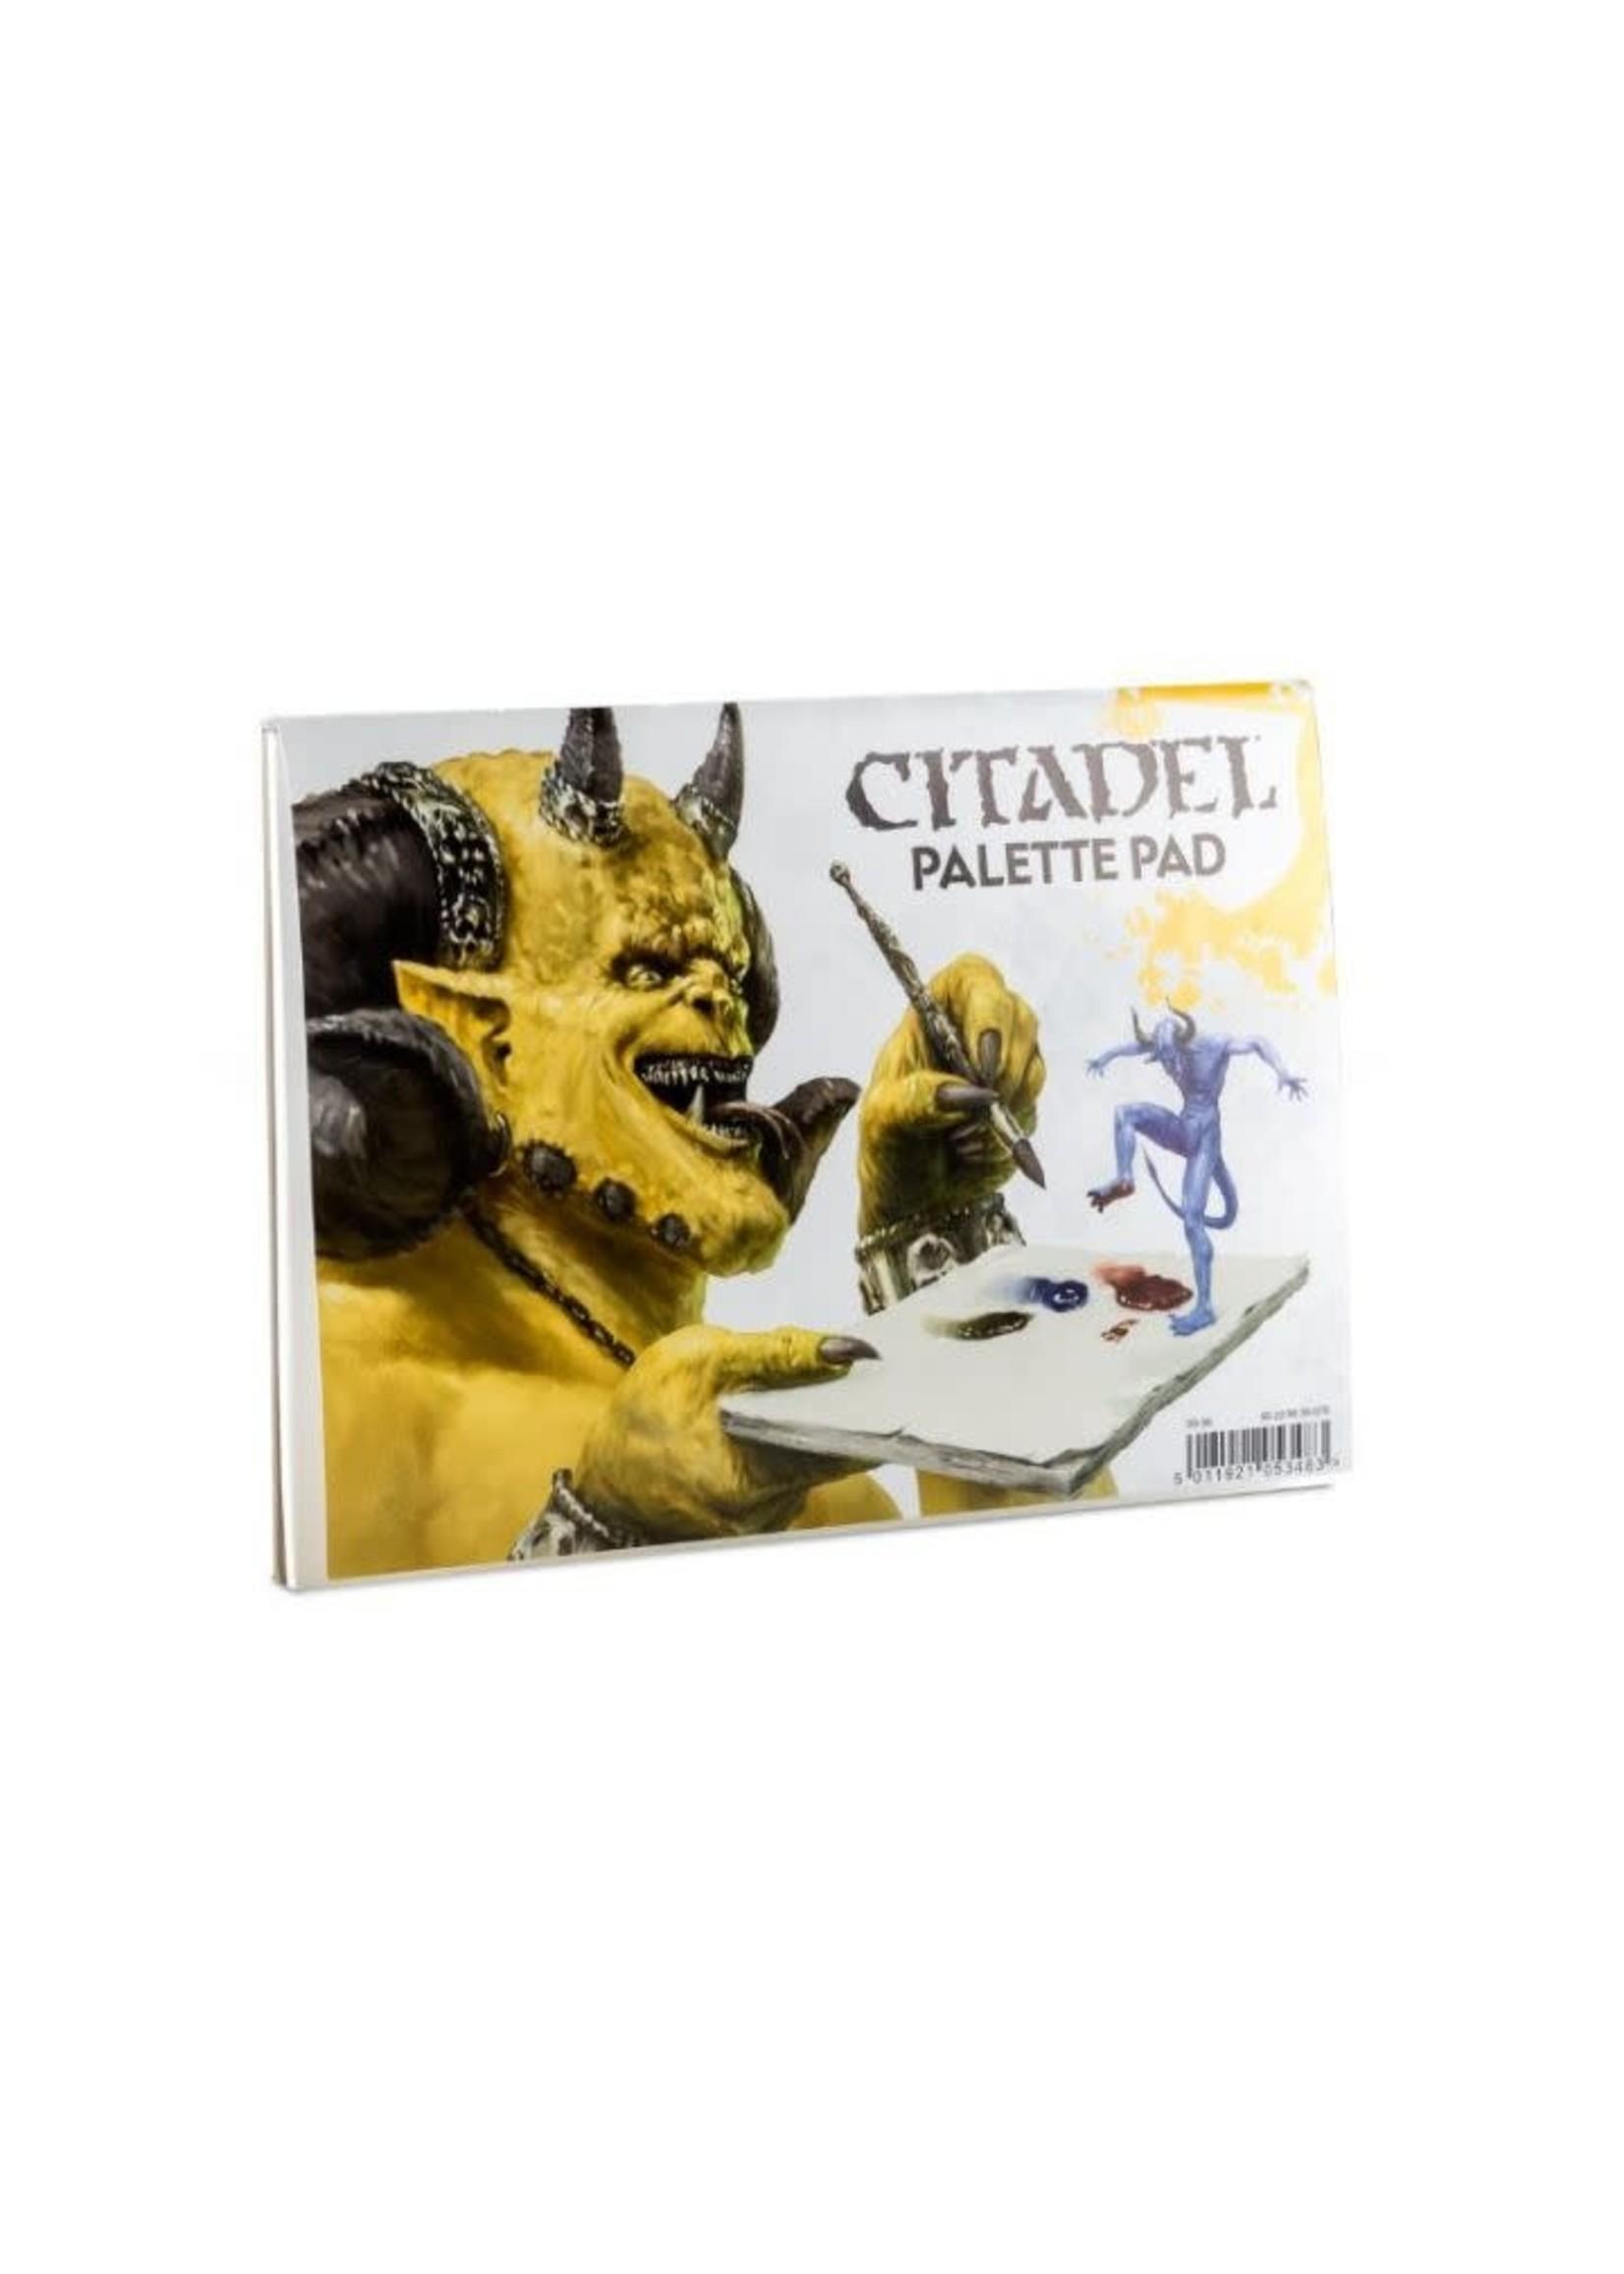 Citadel Palette Pad